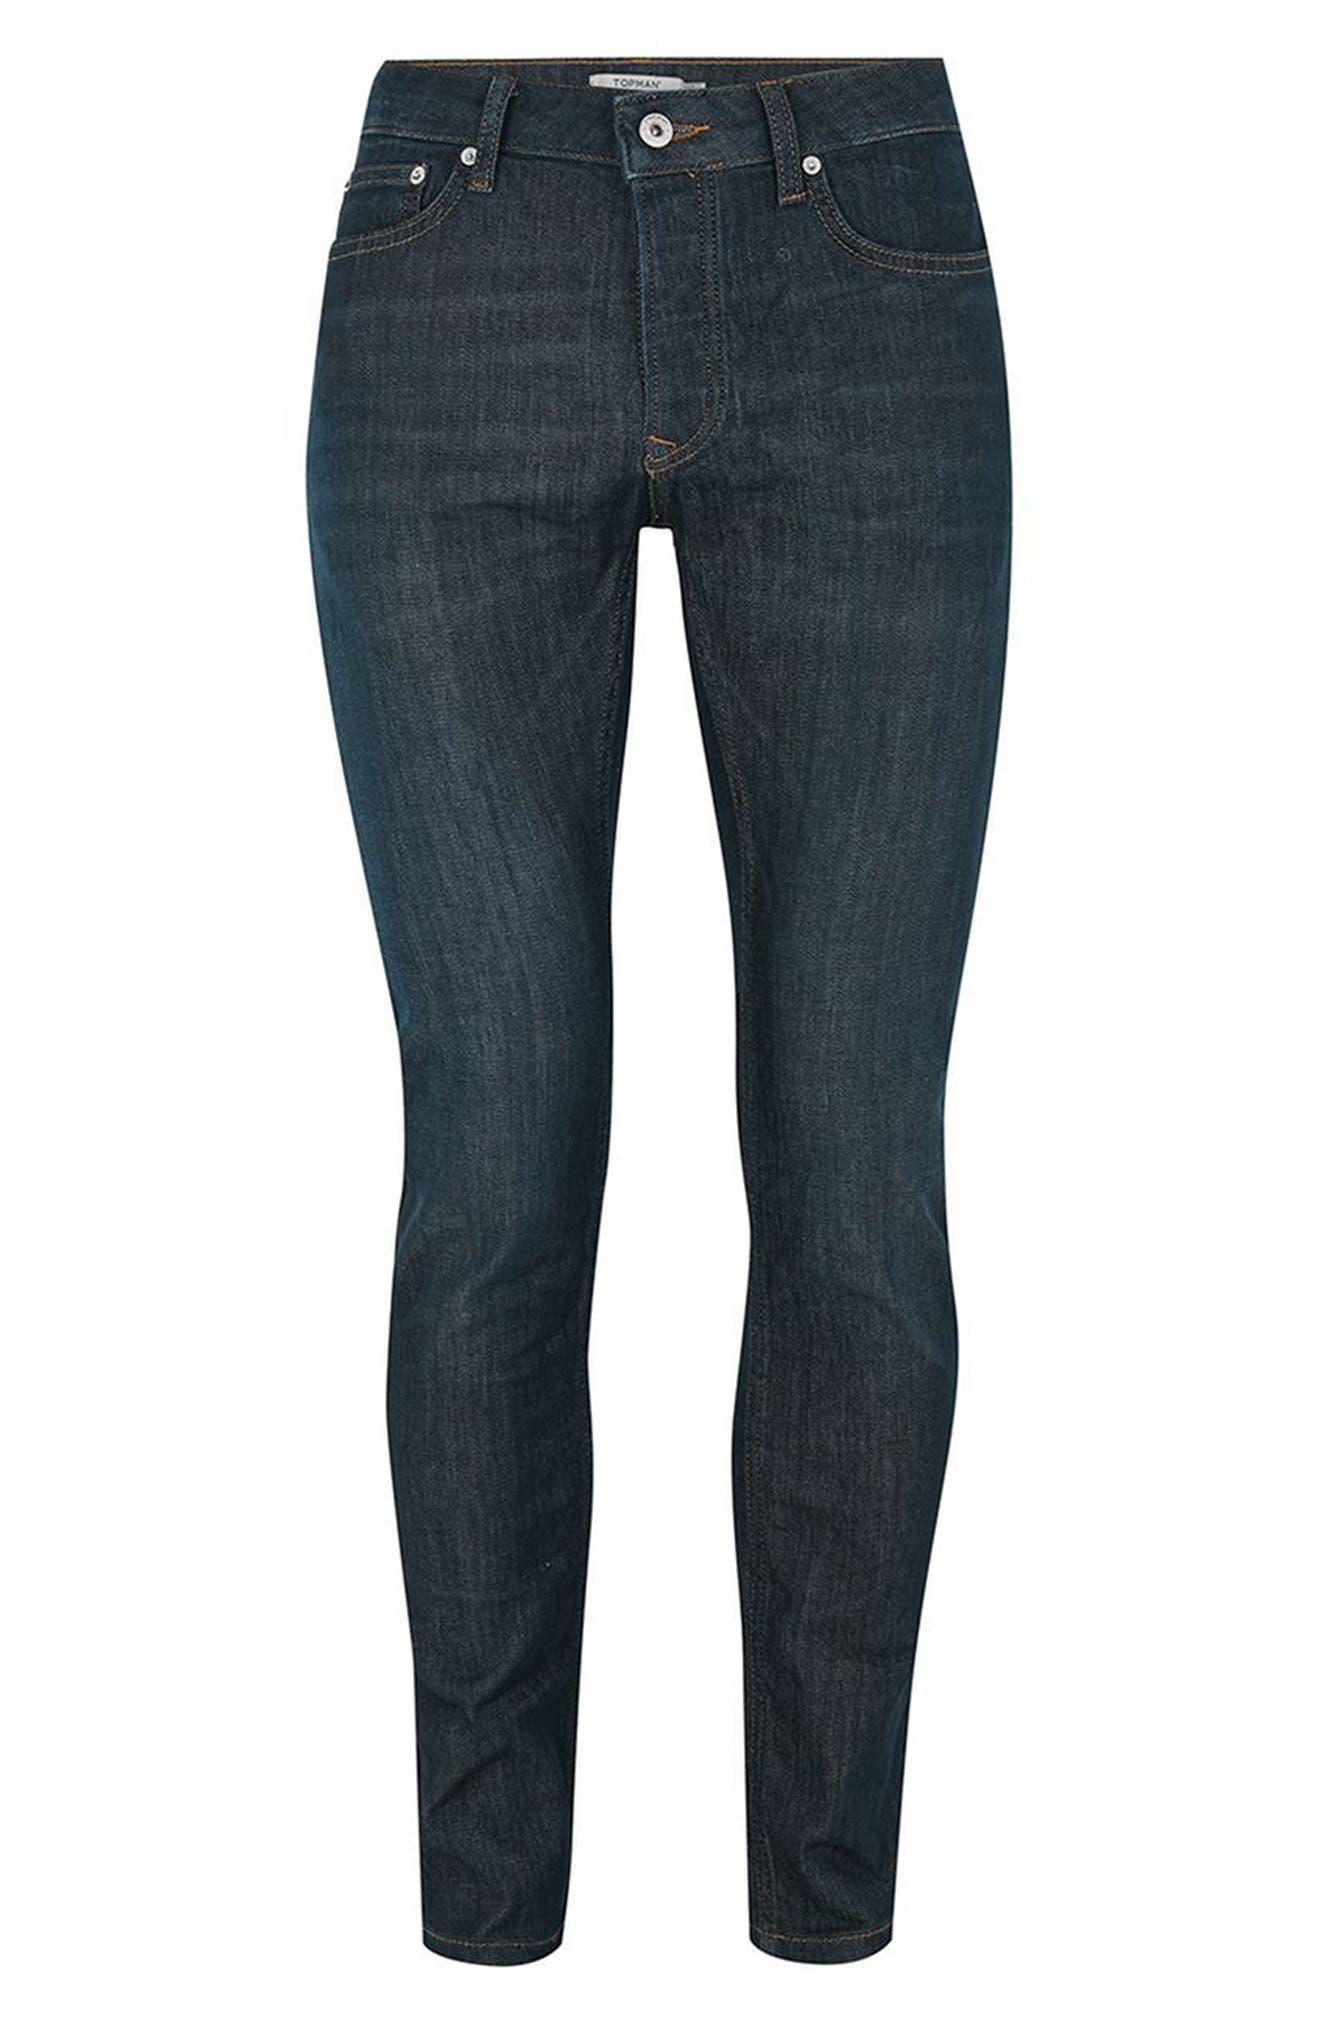 Coated Denim Skinny Jeans,                             Alternate thumbnail 4, color,                             BLUE